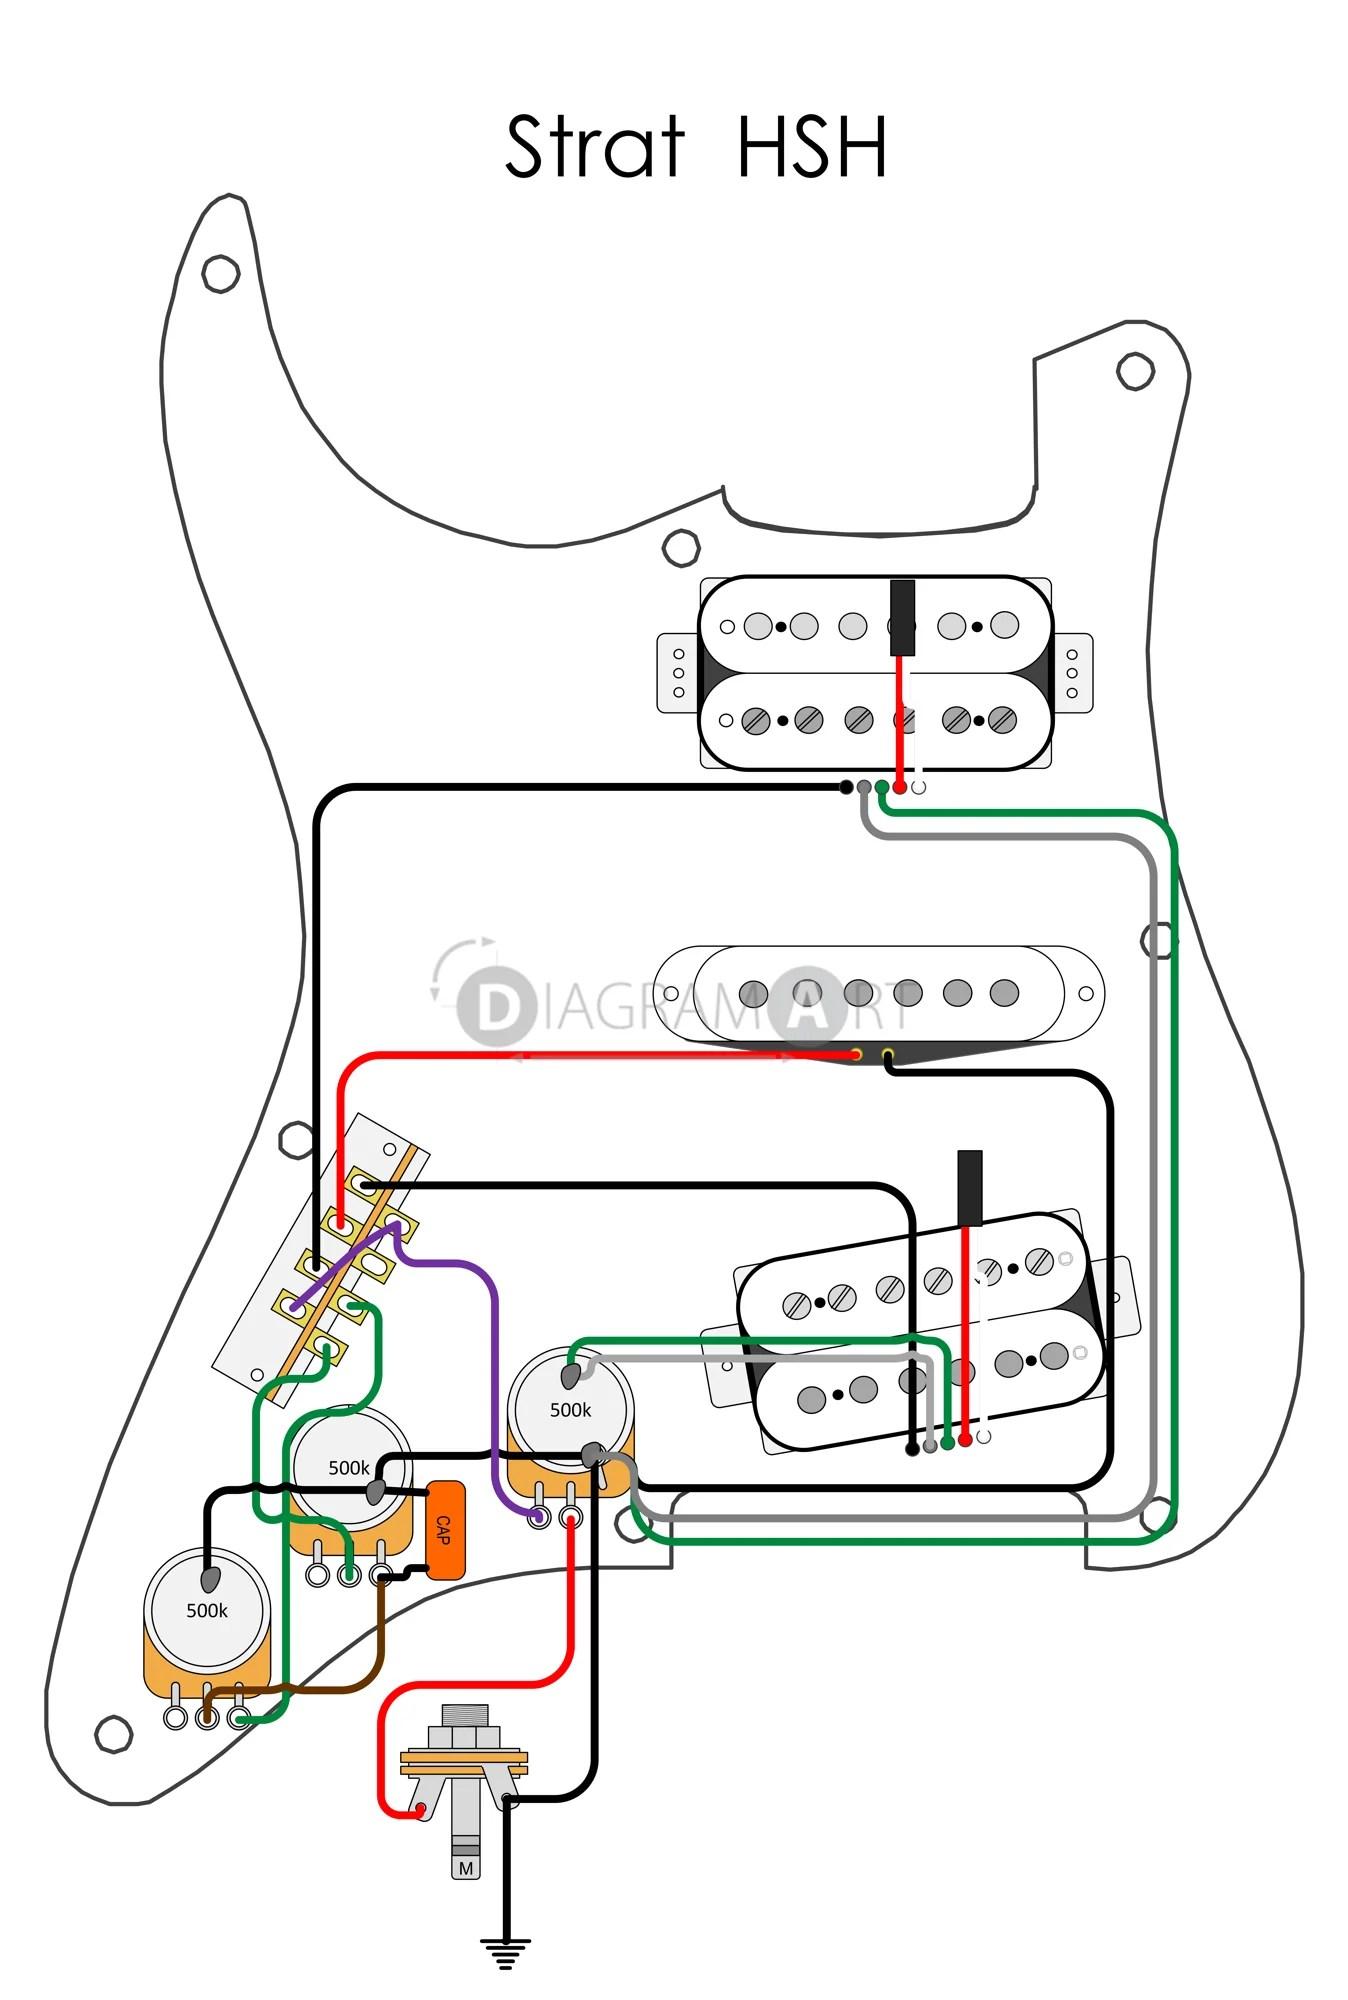 medium resolution of electric guitar wiring strat hsh electric circuit diagramart arbor electric guitars electric guitar wiring